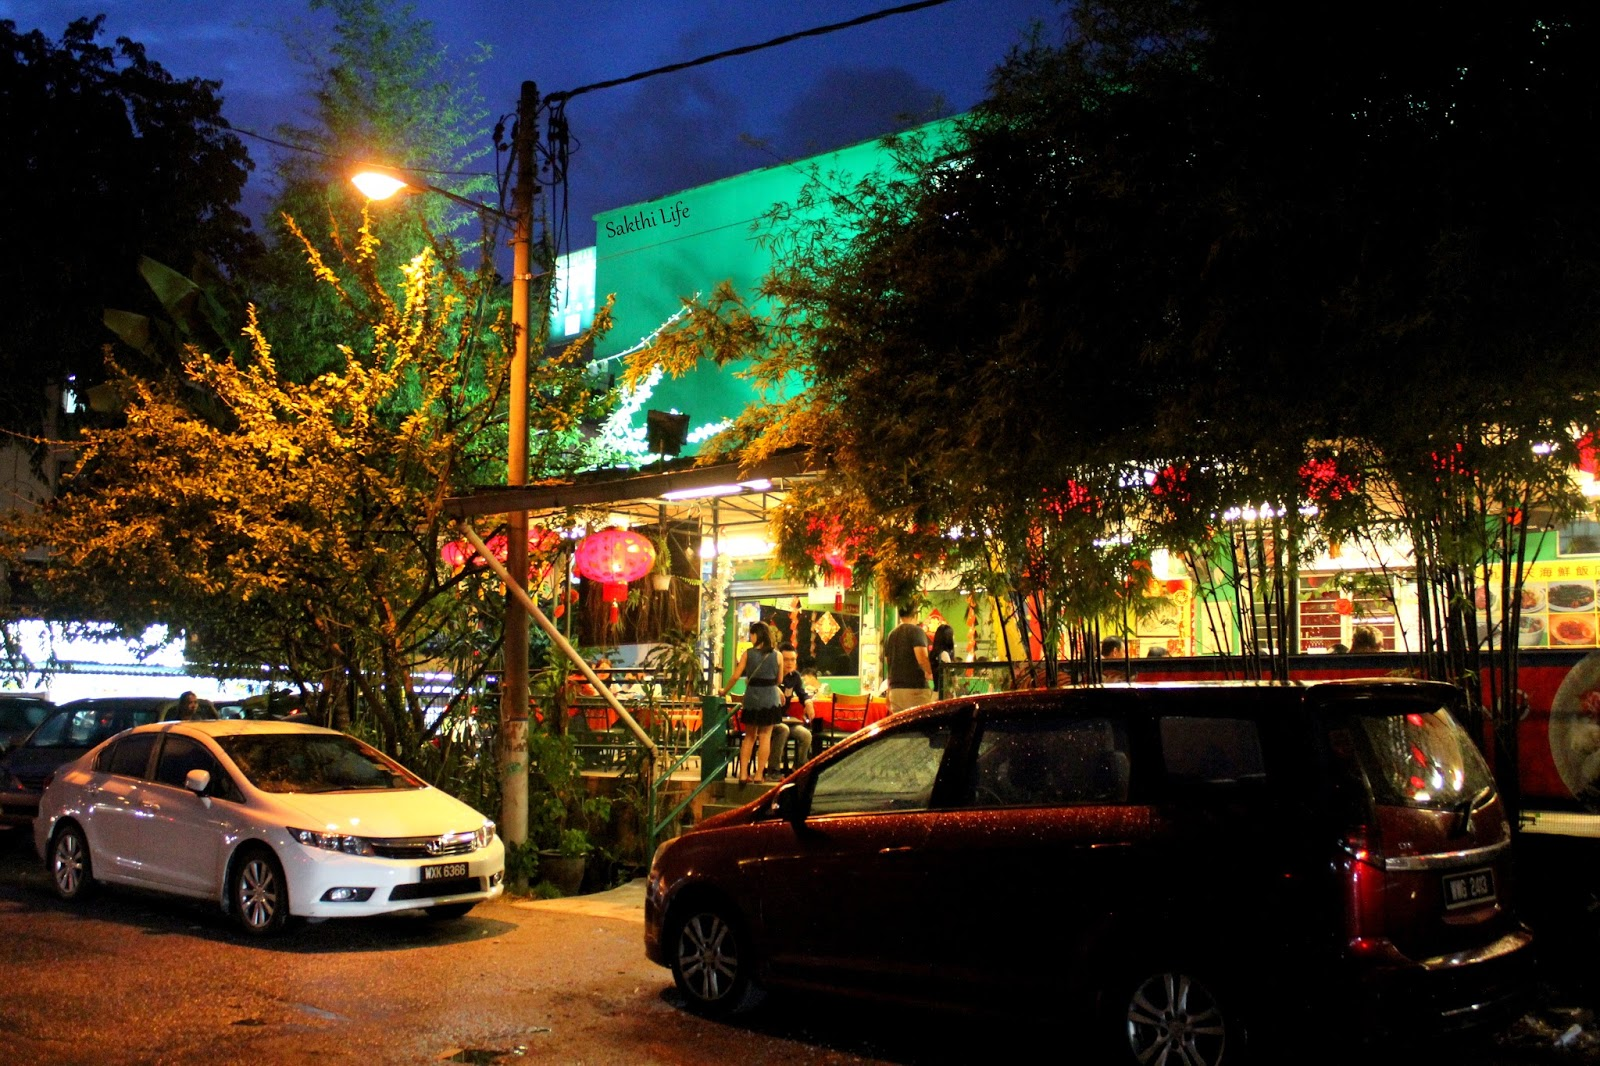 Restoran Fresh Fried Seafood @ Happy Garden, Jalan Kuchai Lama